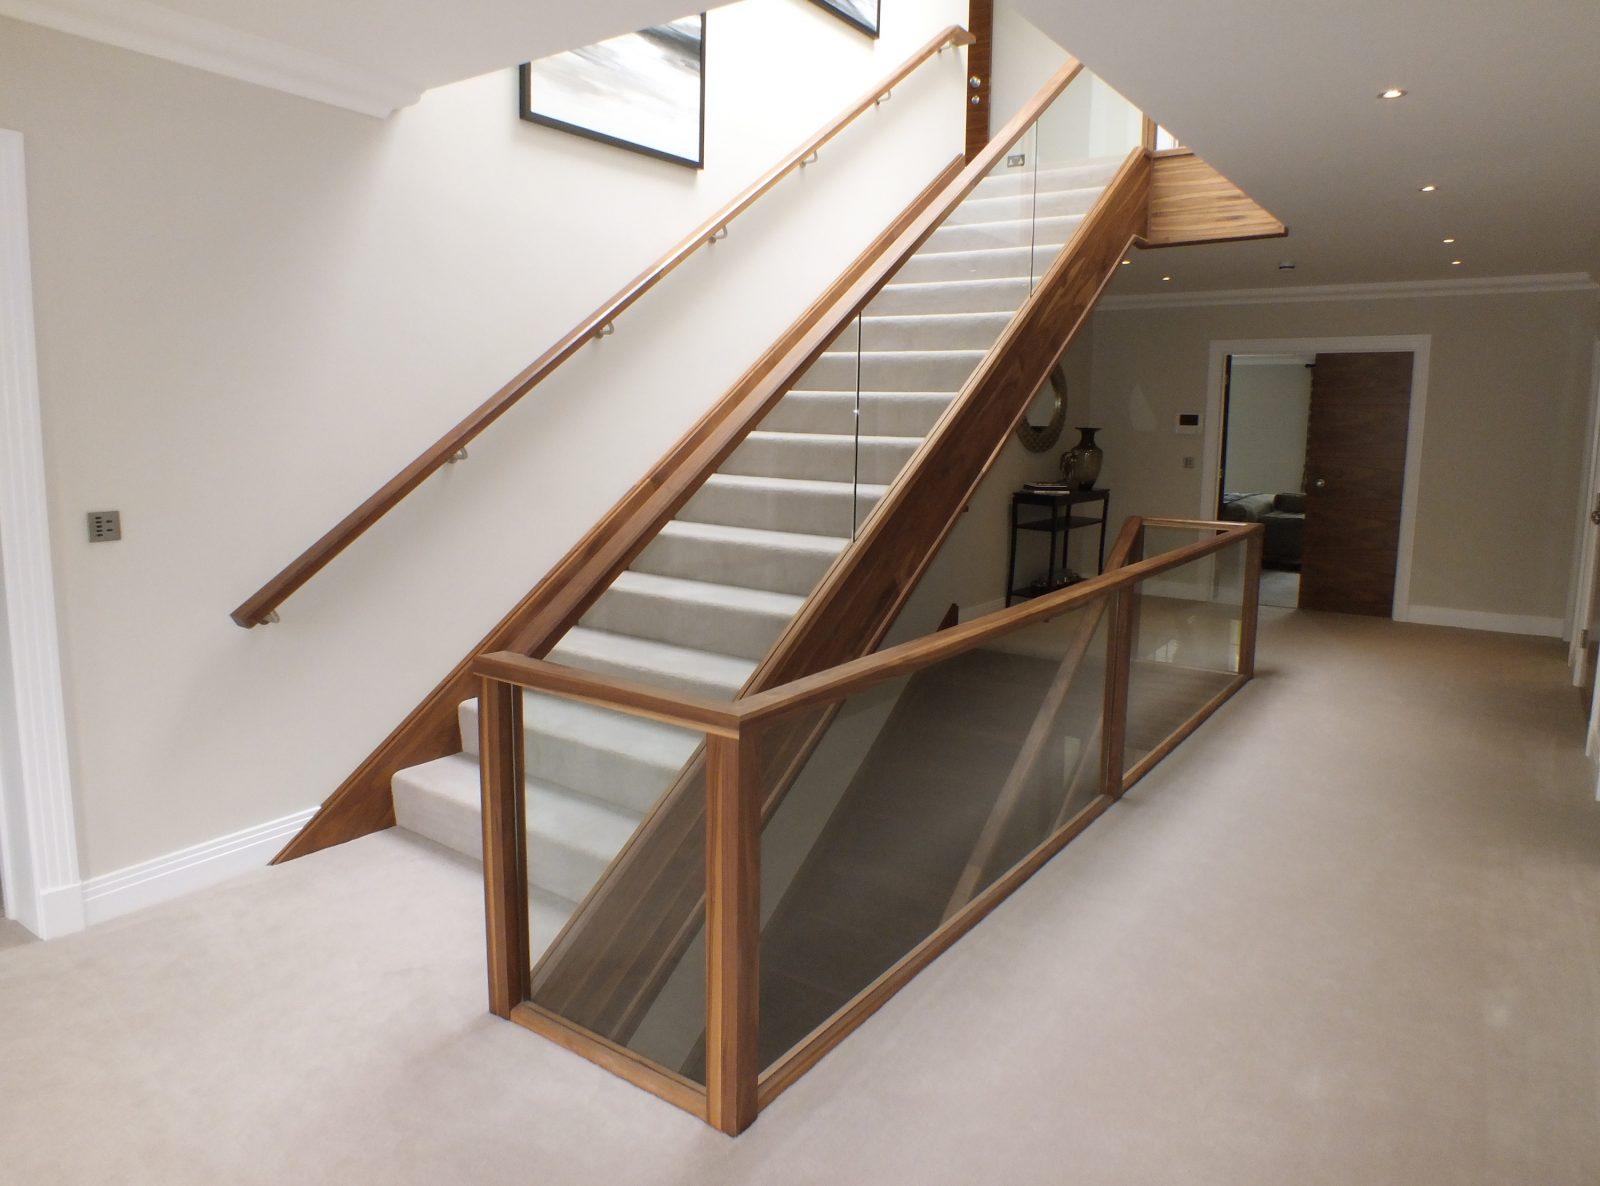 glass staircase design manufacture edwards hampson ltd